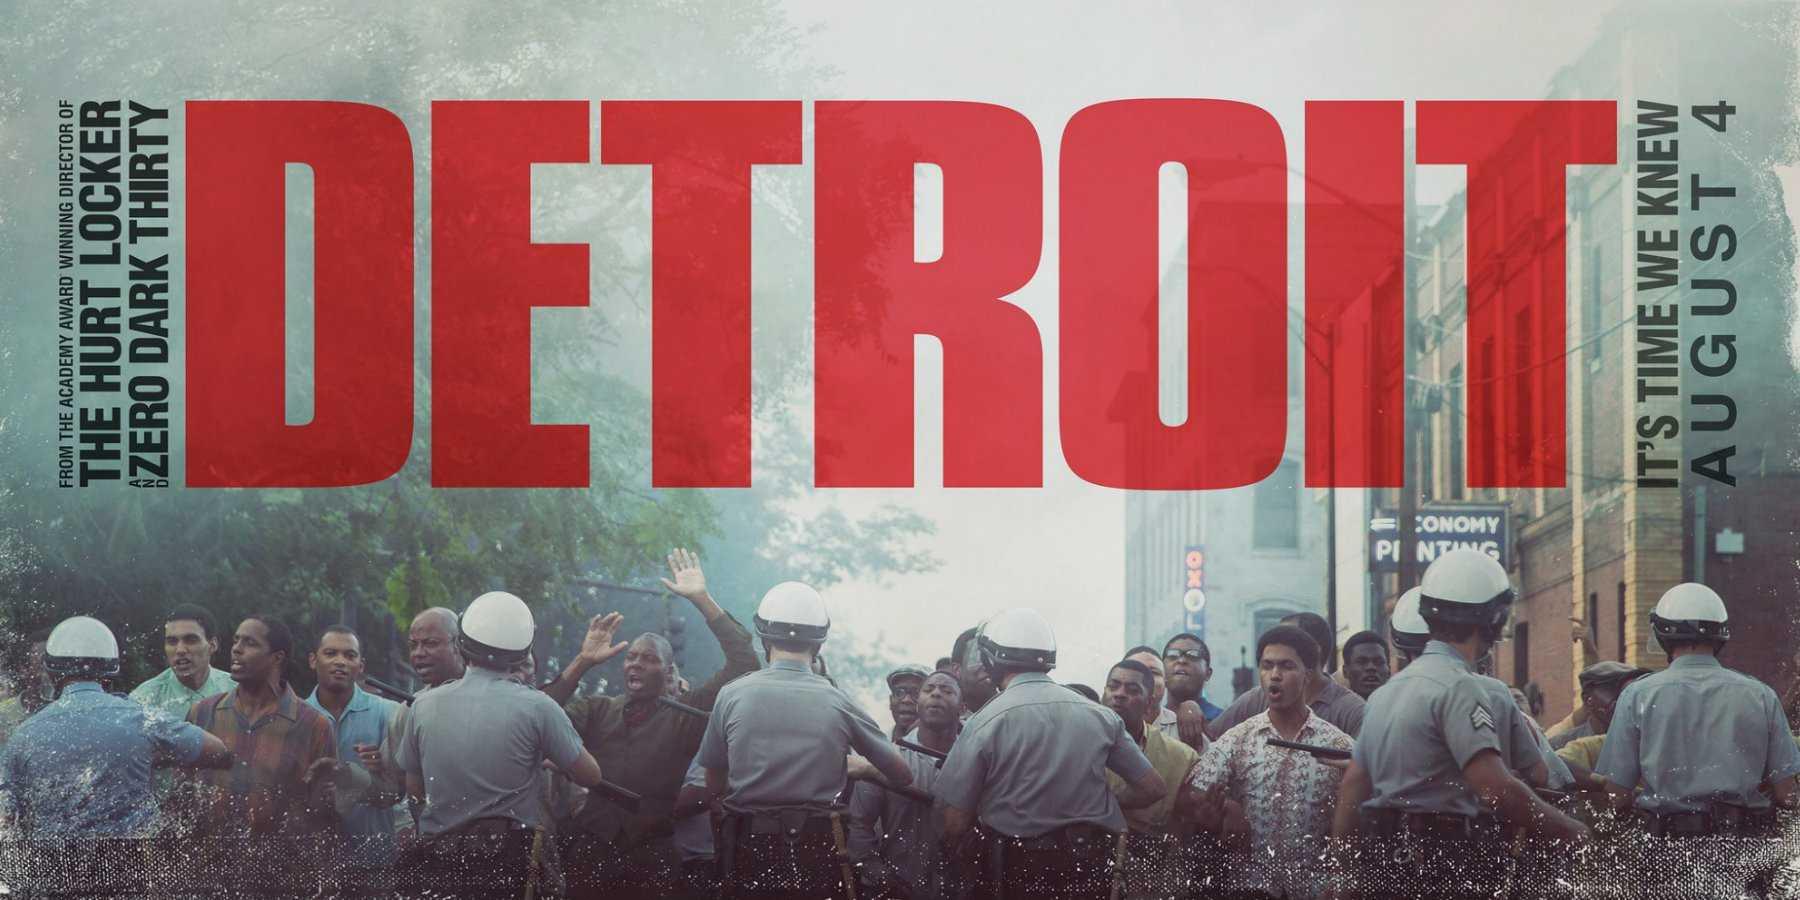 Detriot-movie-poster-trailer-2017.jpg